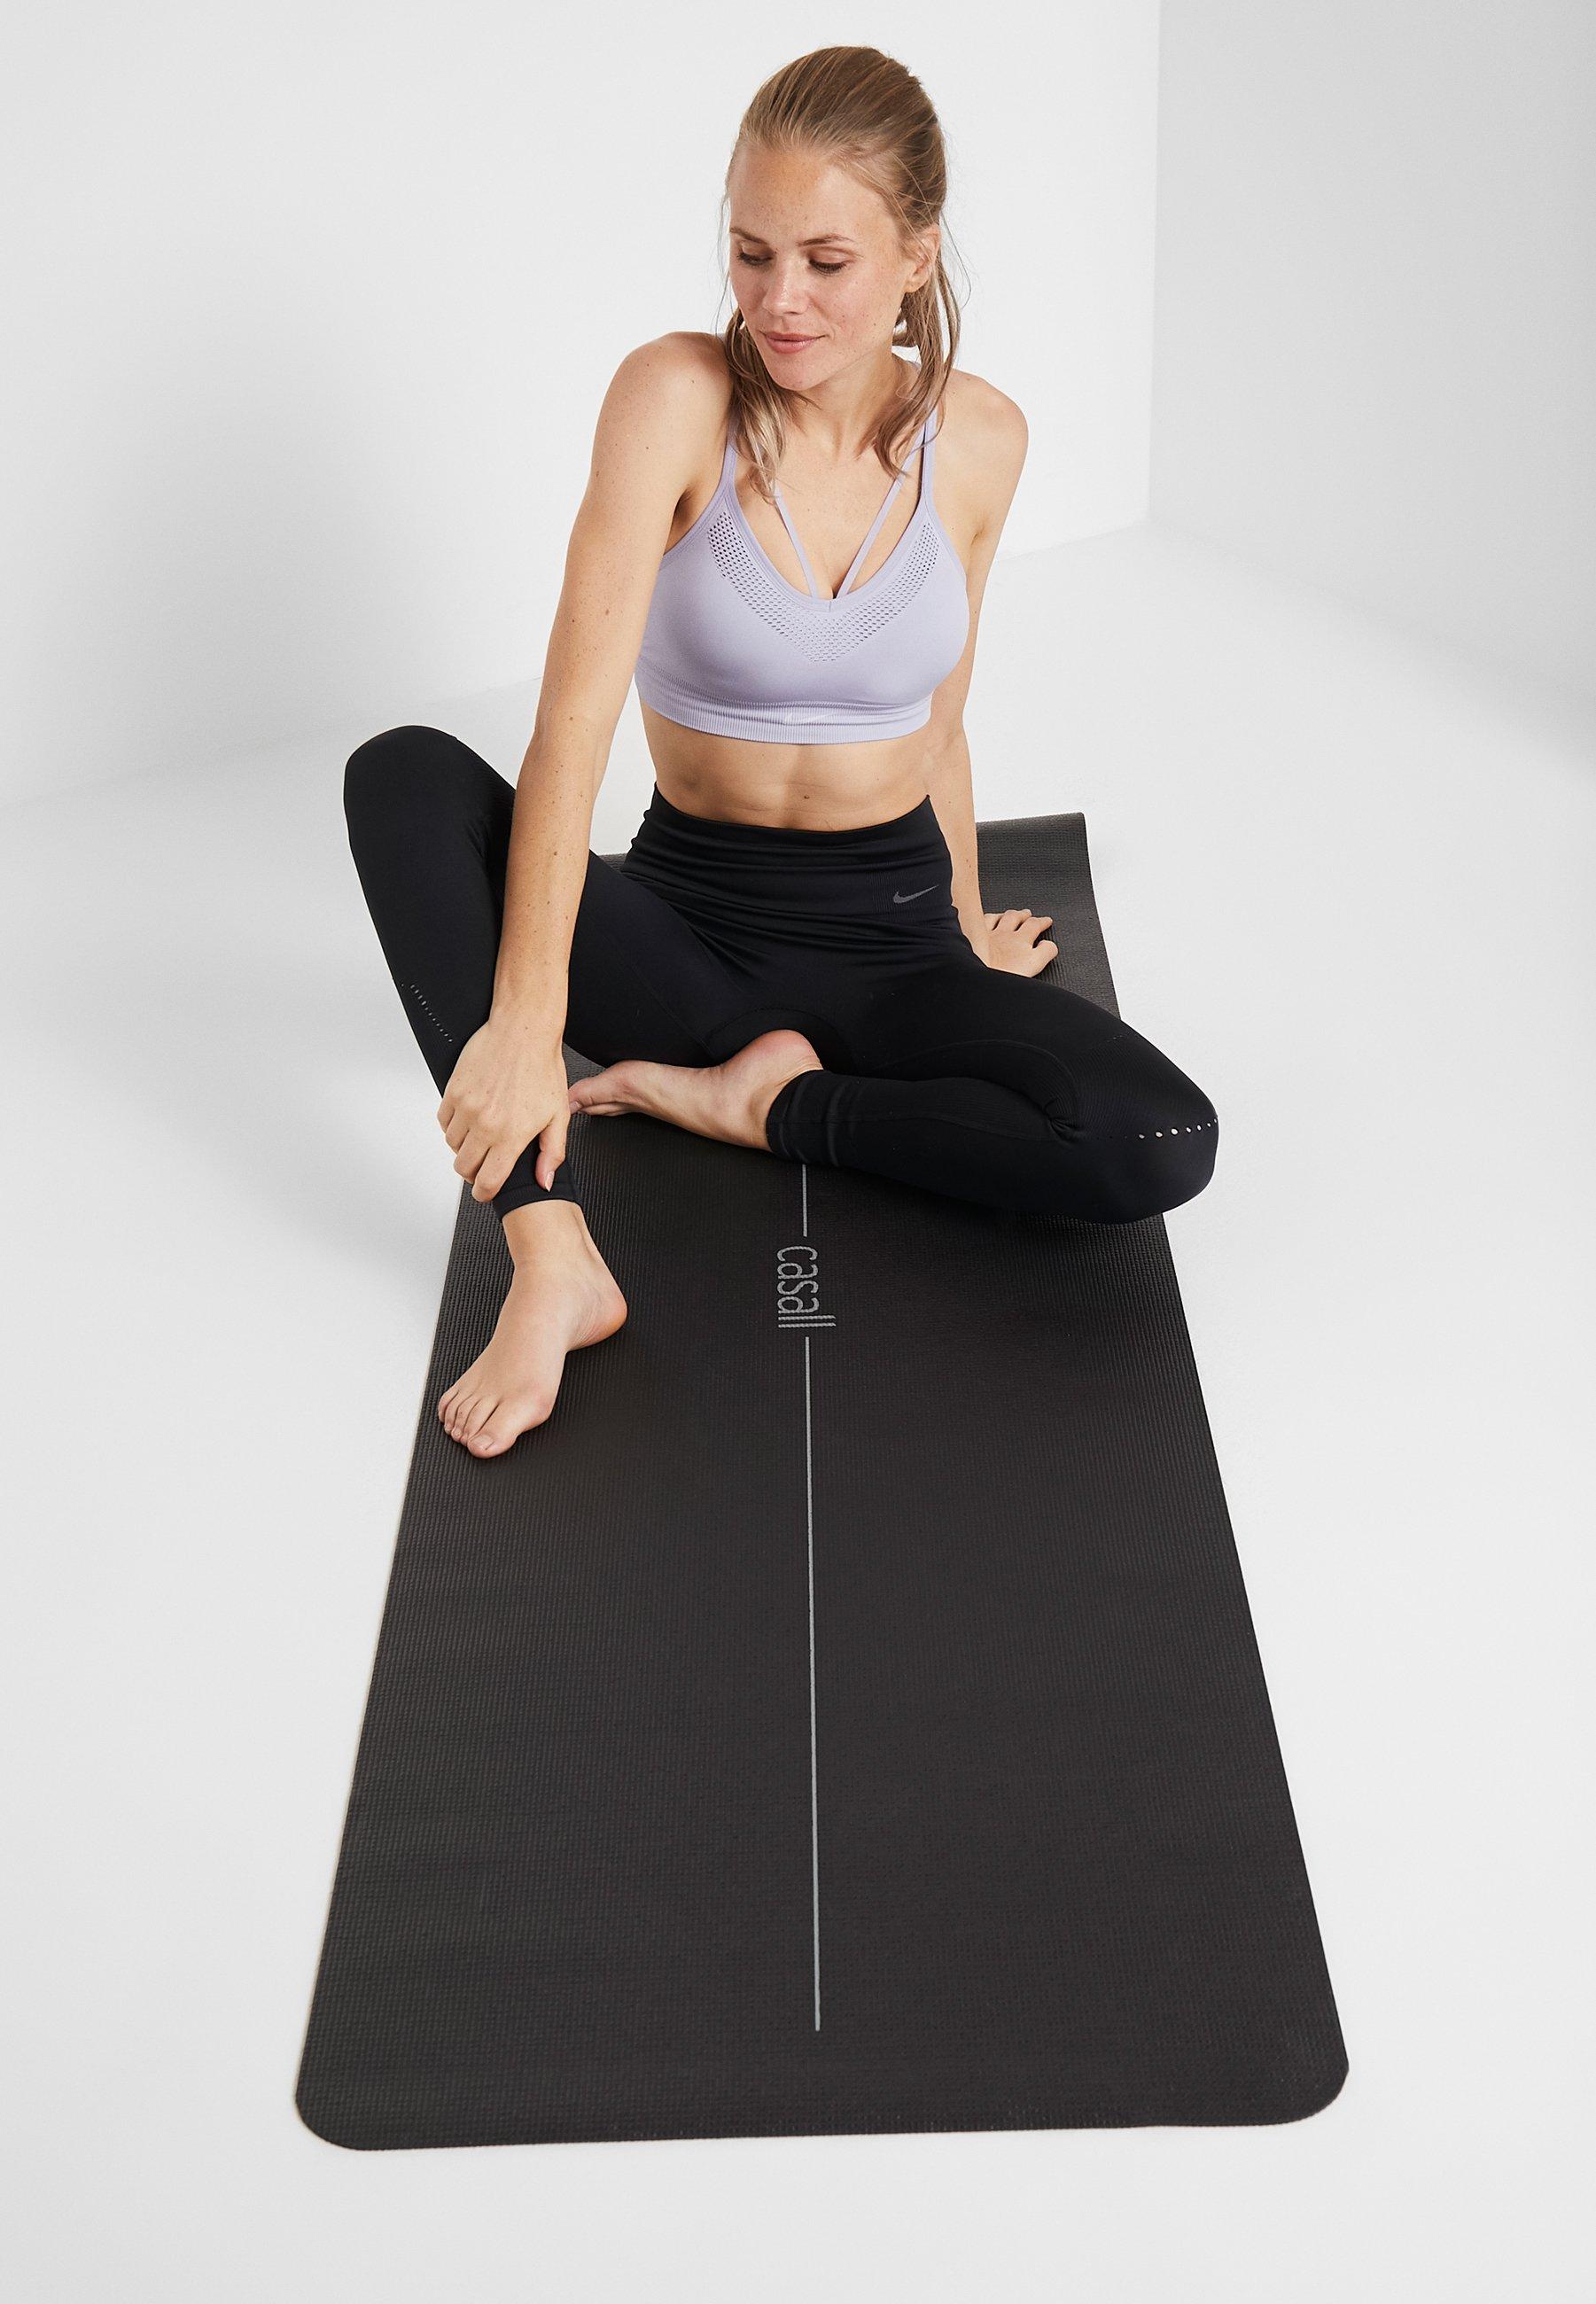 Donna EXERCISE MAT BALANCE - Fitness / Yoga